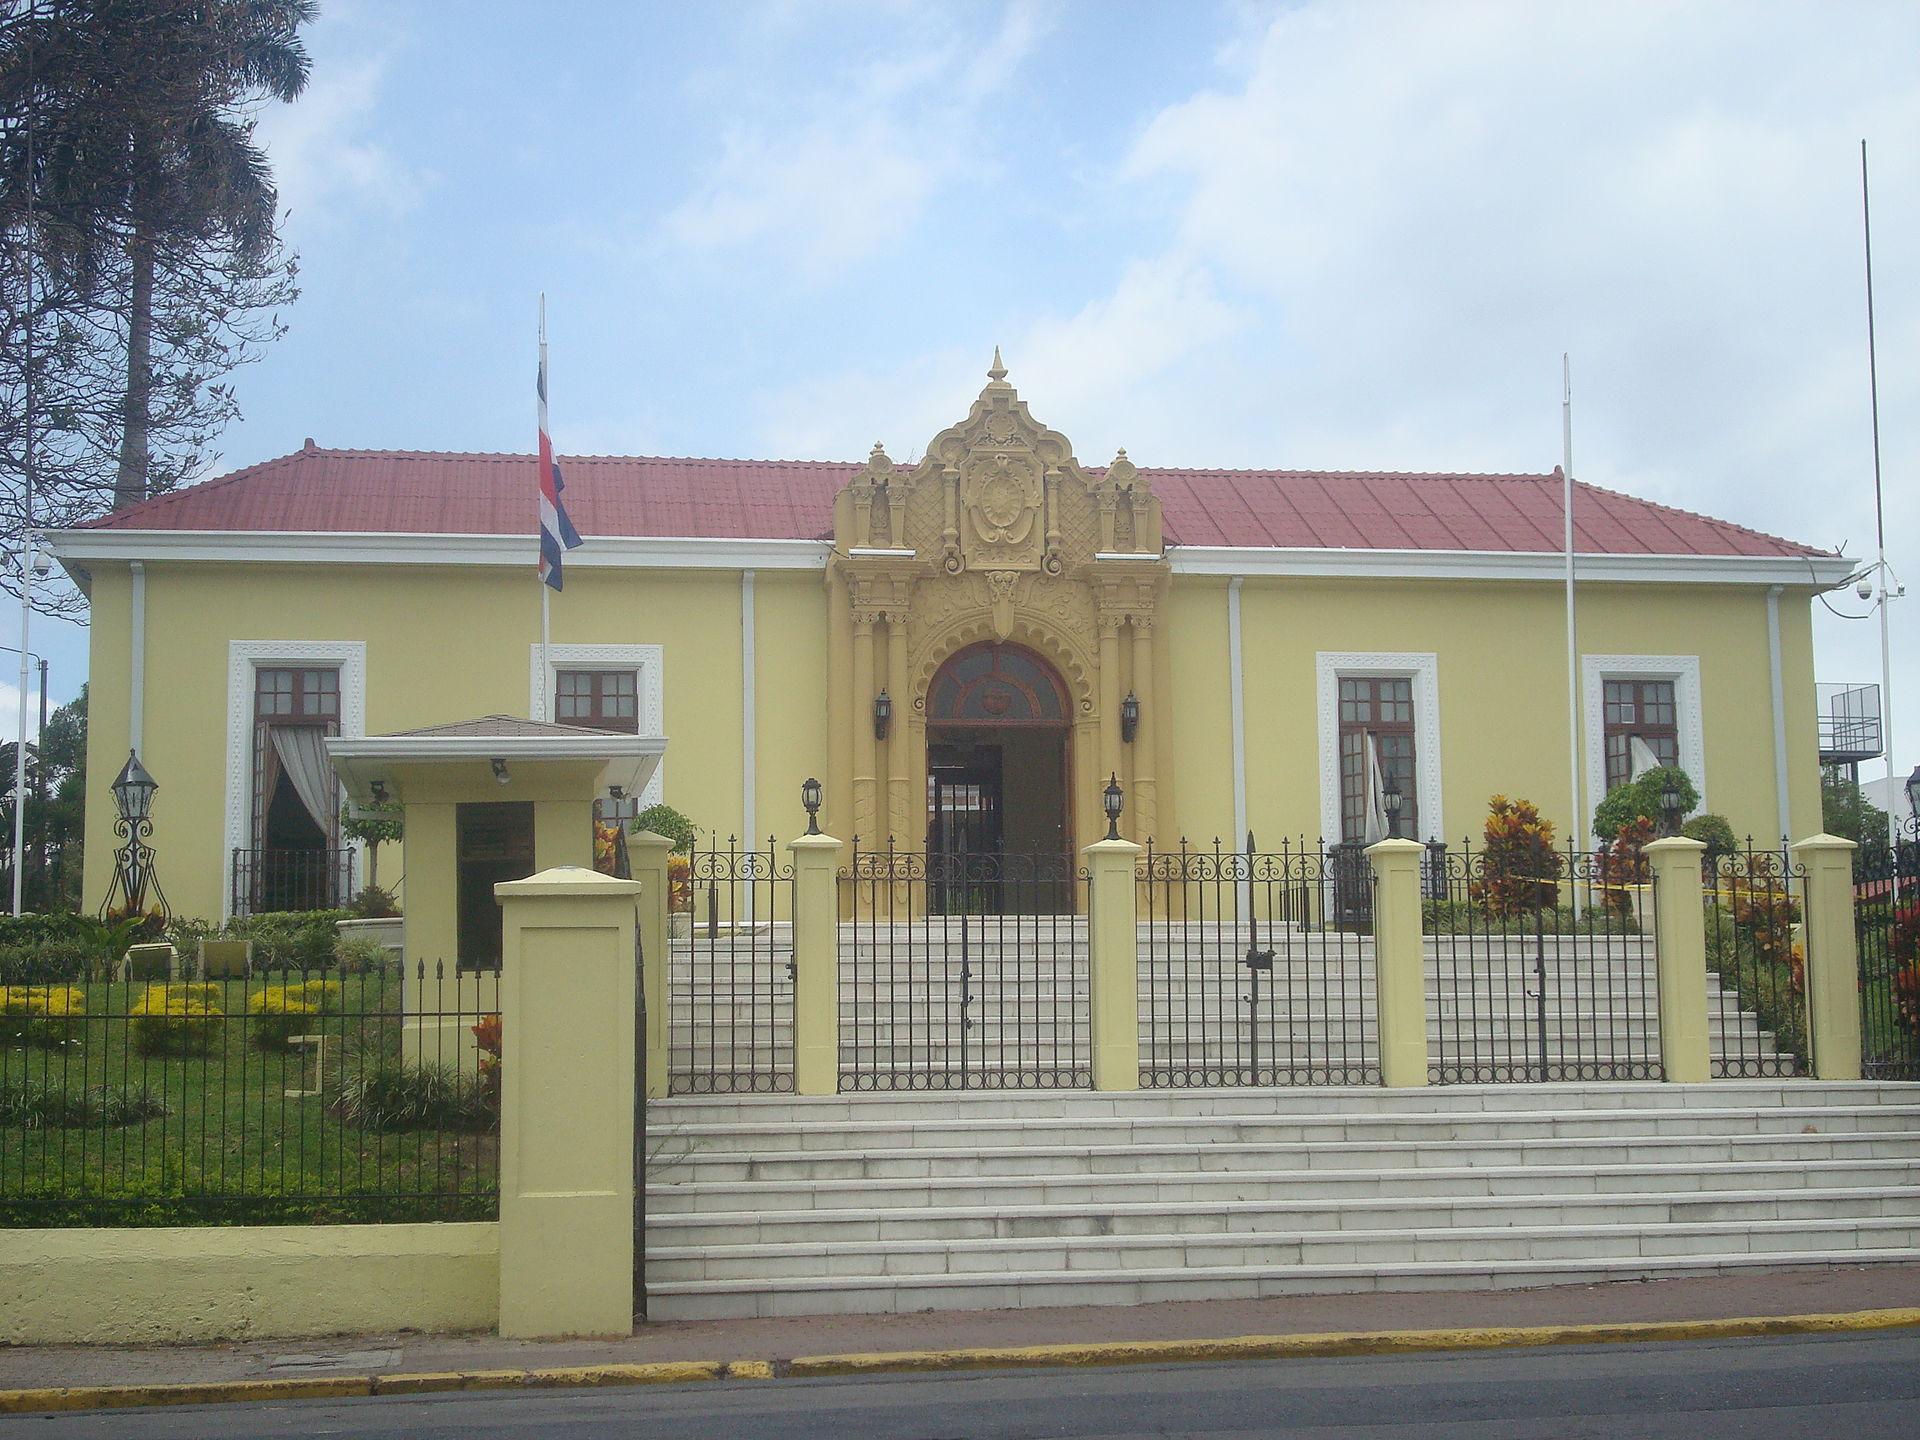 Casa amarilla costa rica wikipedia la enciclopedia libre for La casa amarilla banos